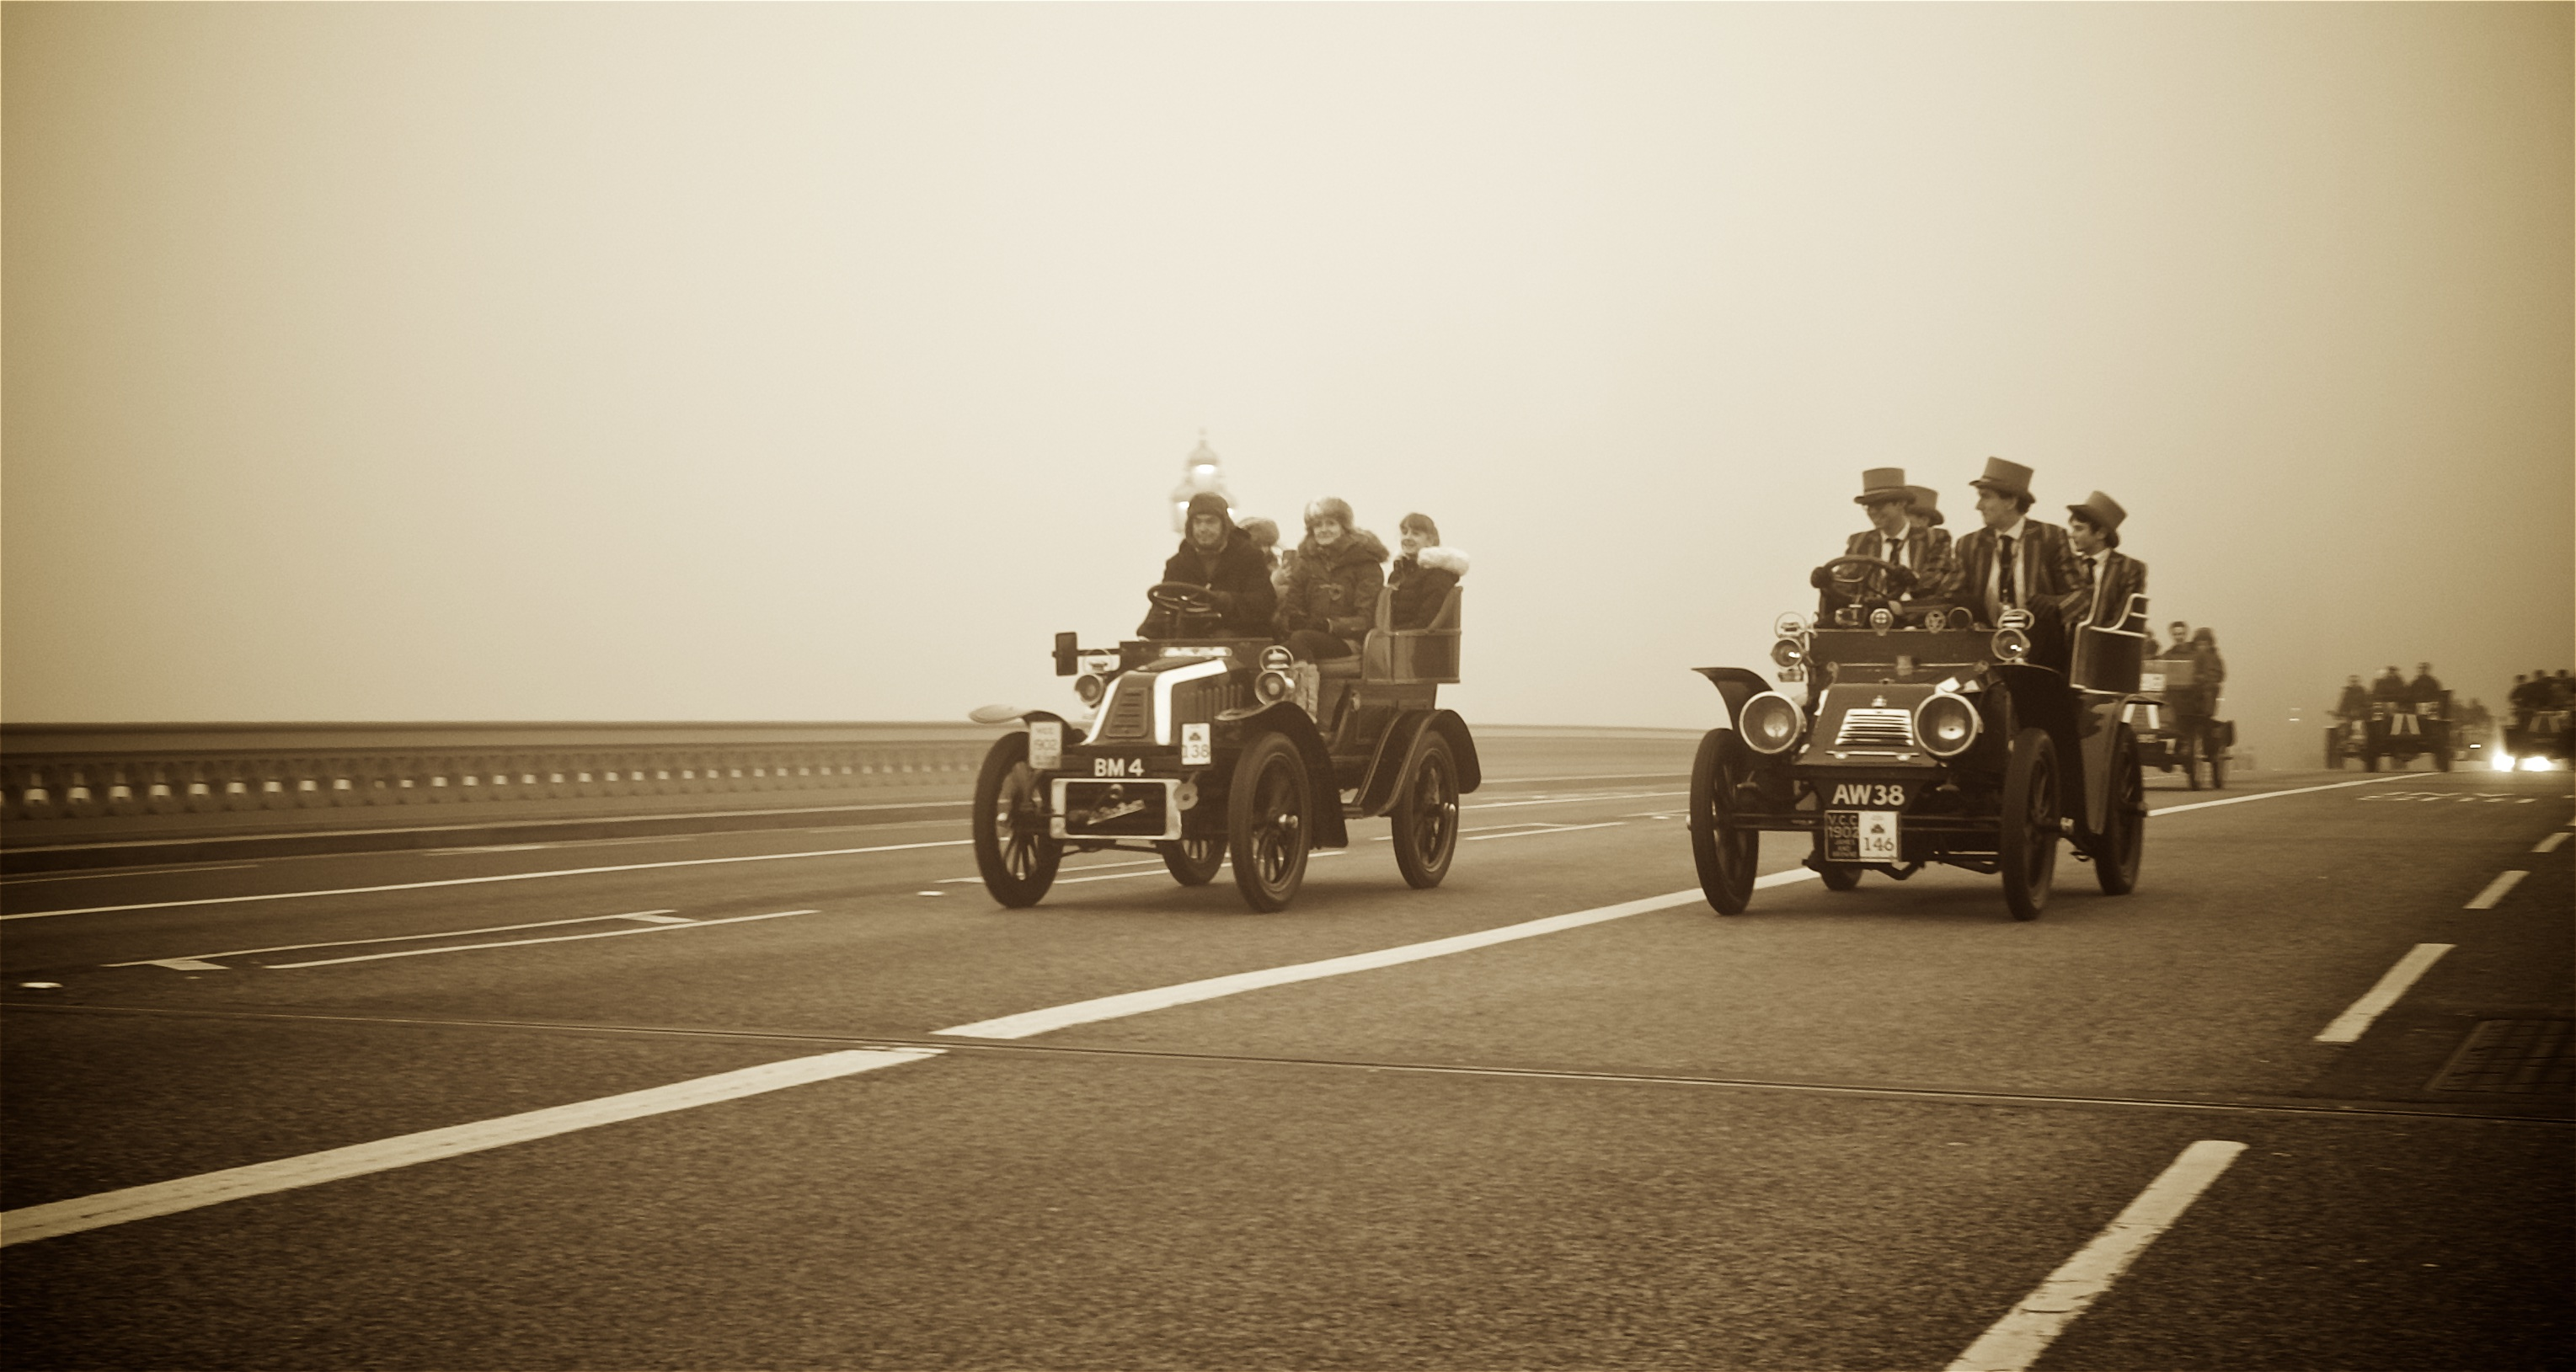 London to Brighton Movember Ride of a Lifetime